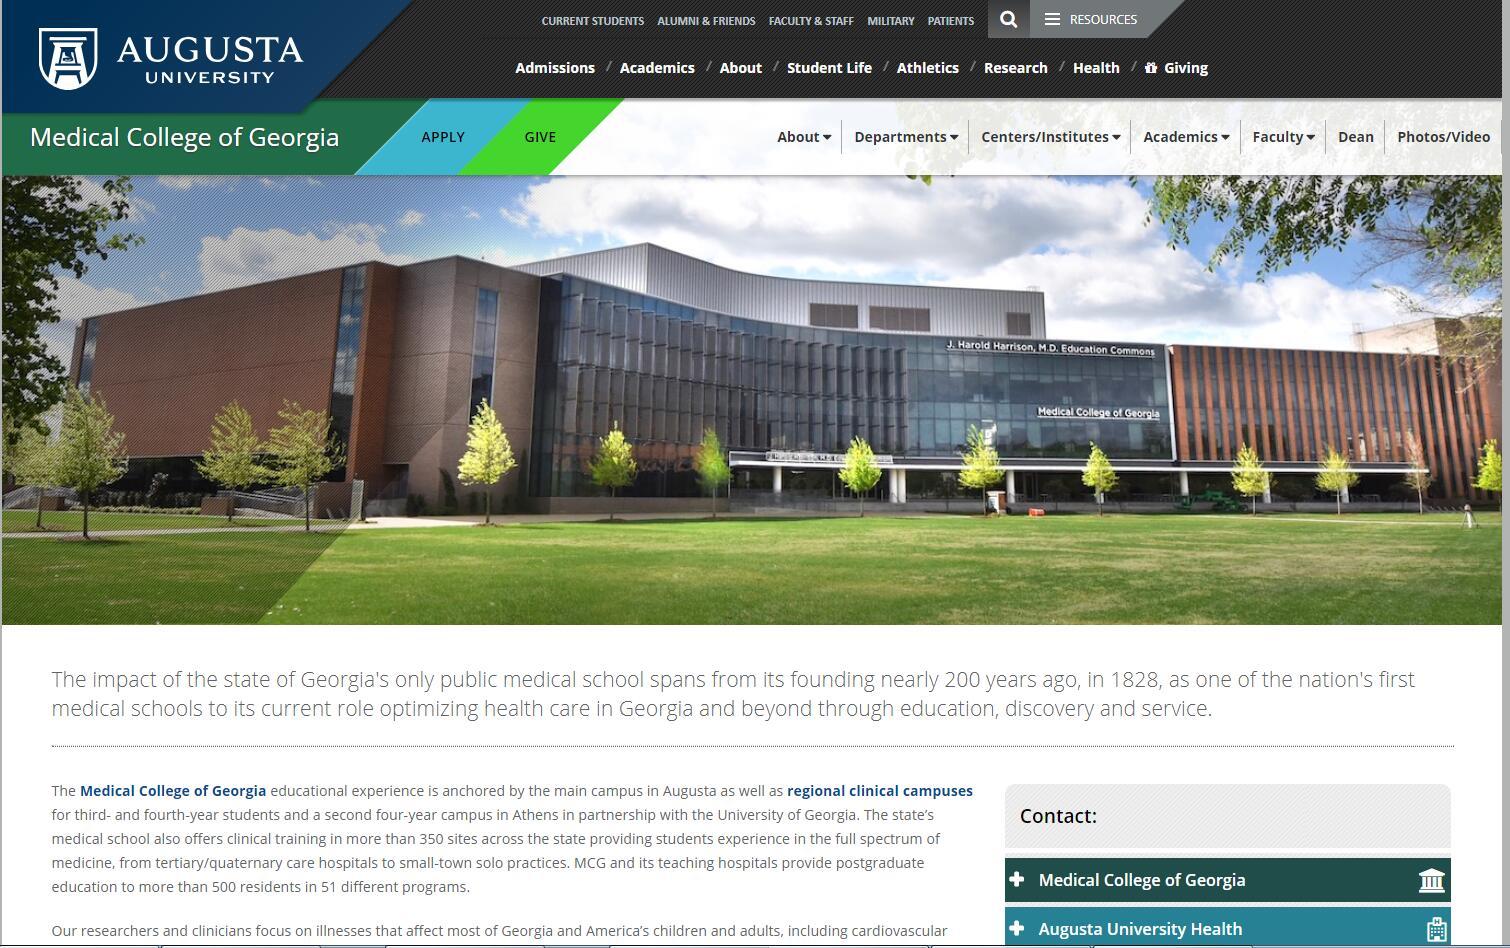 The Medical College of Georgia at Georgia Health Sciences University